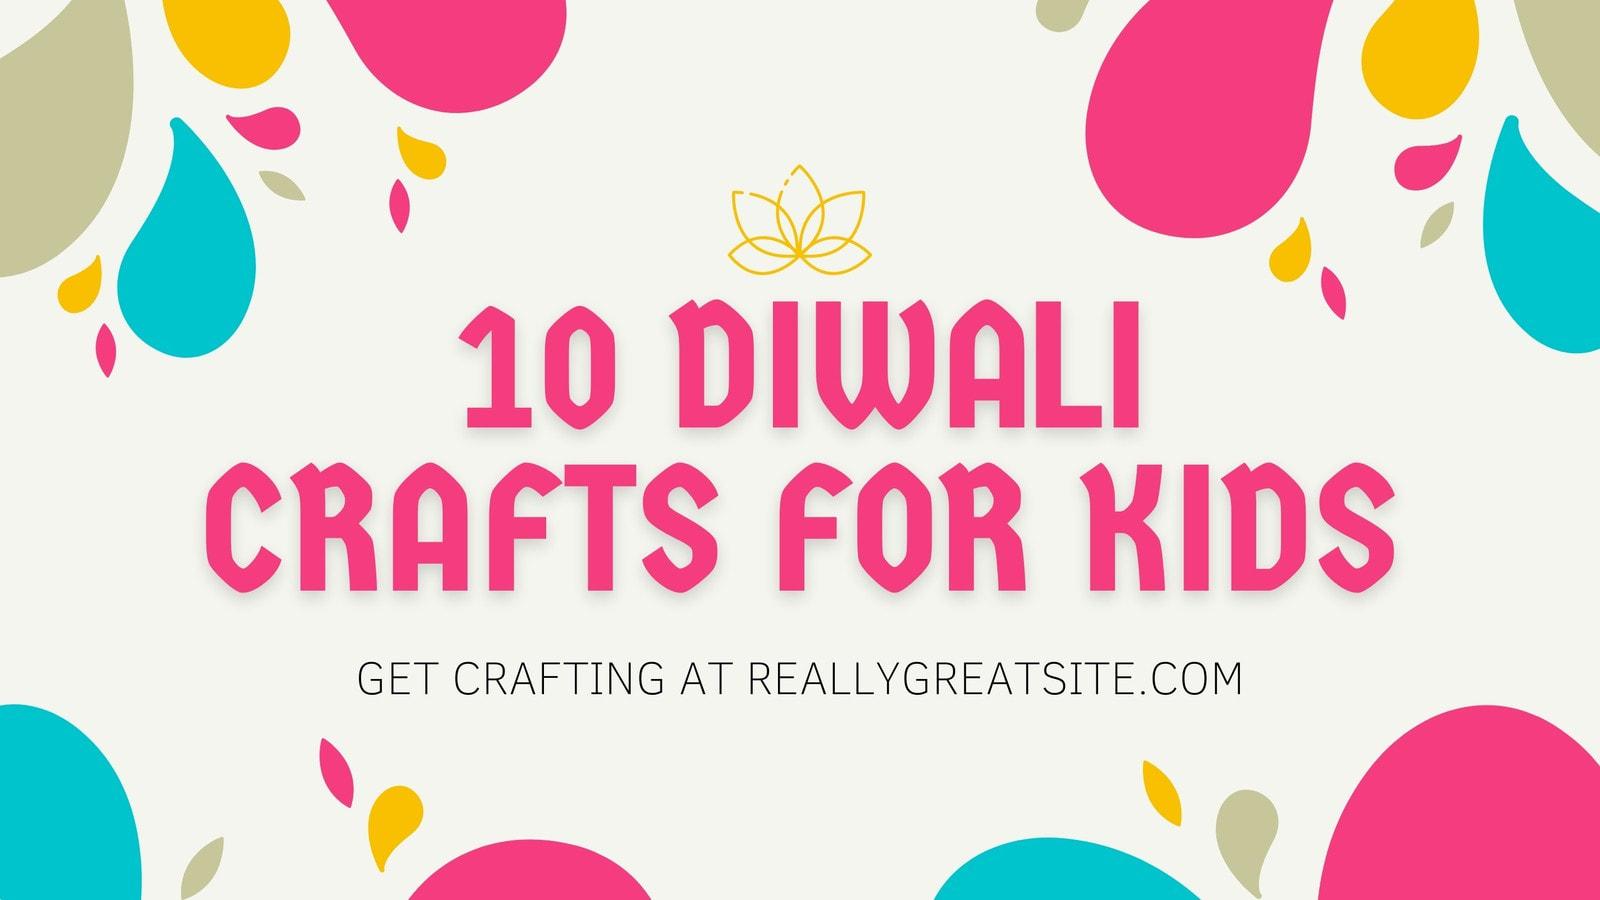 Pink, Gold, and Teal Illustrated Diwali Blog Banner